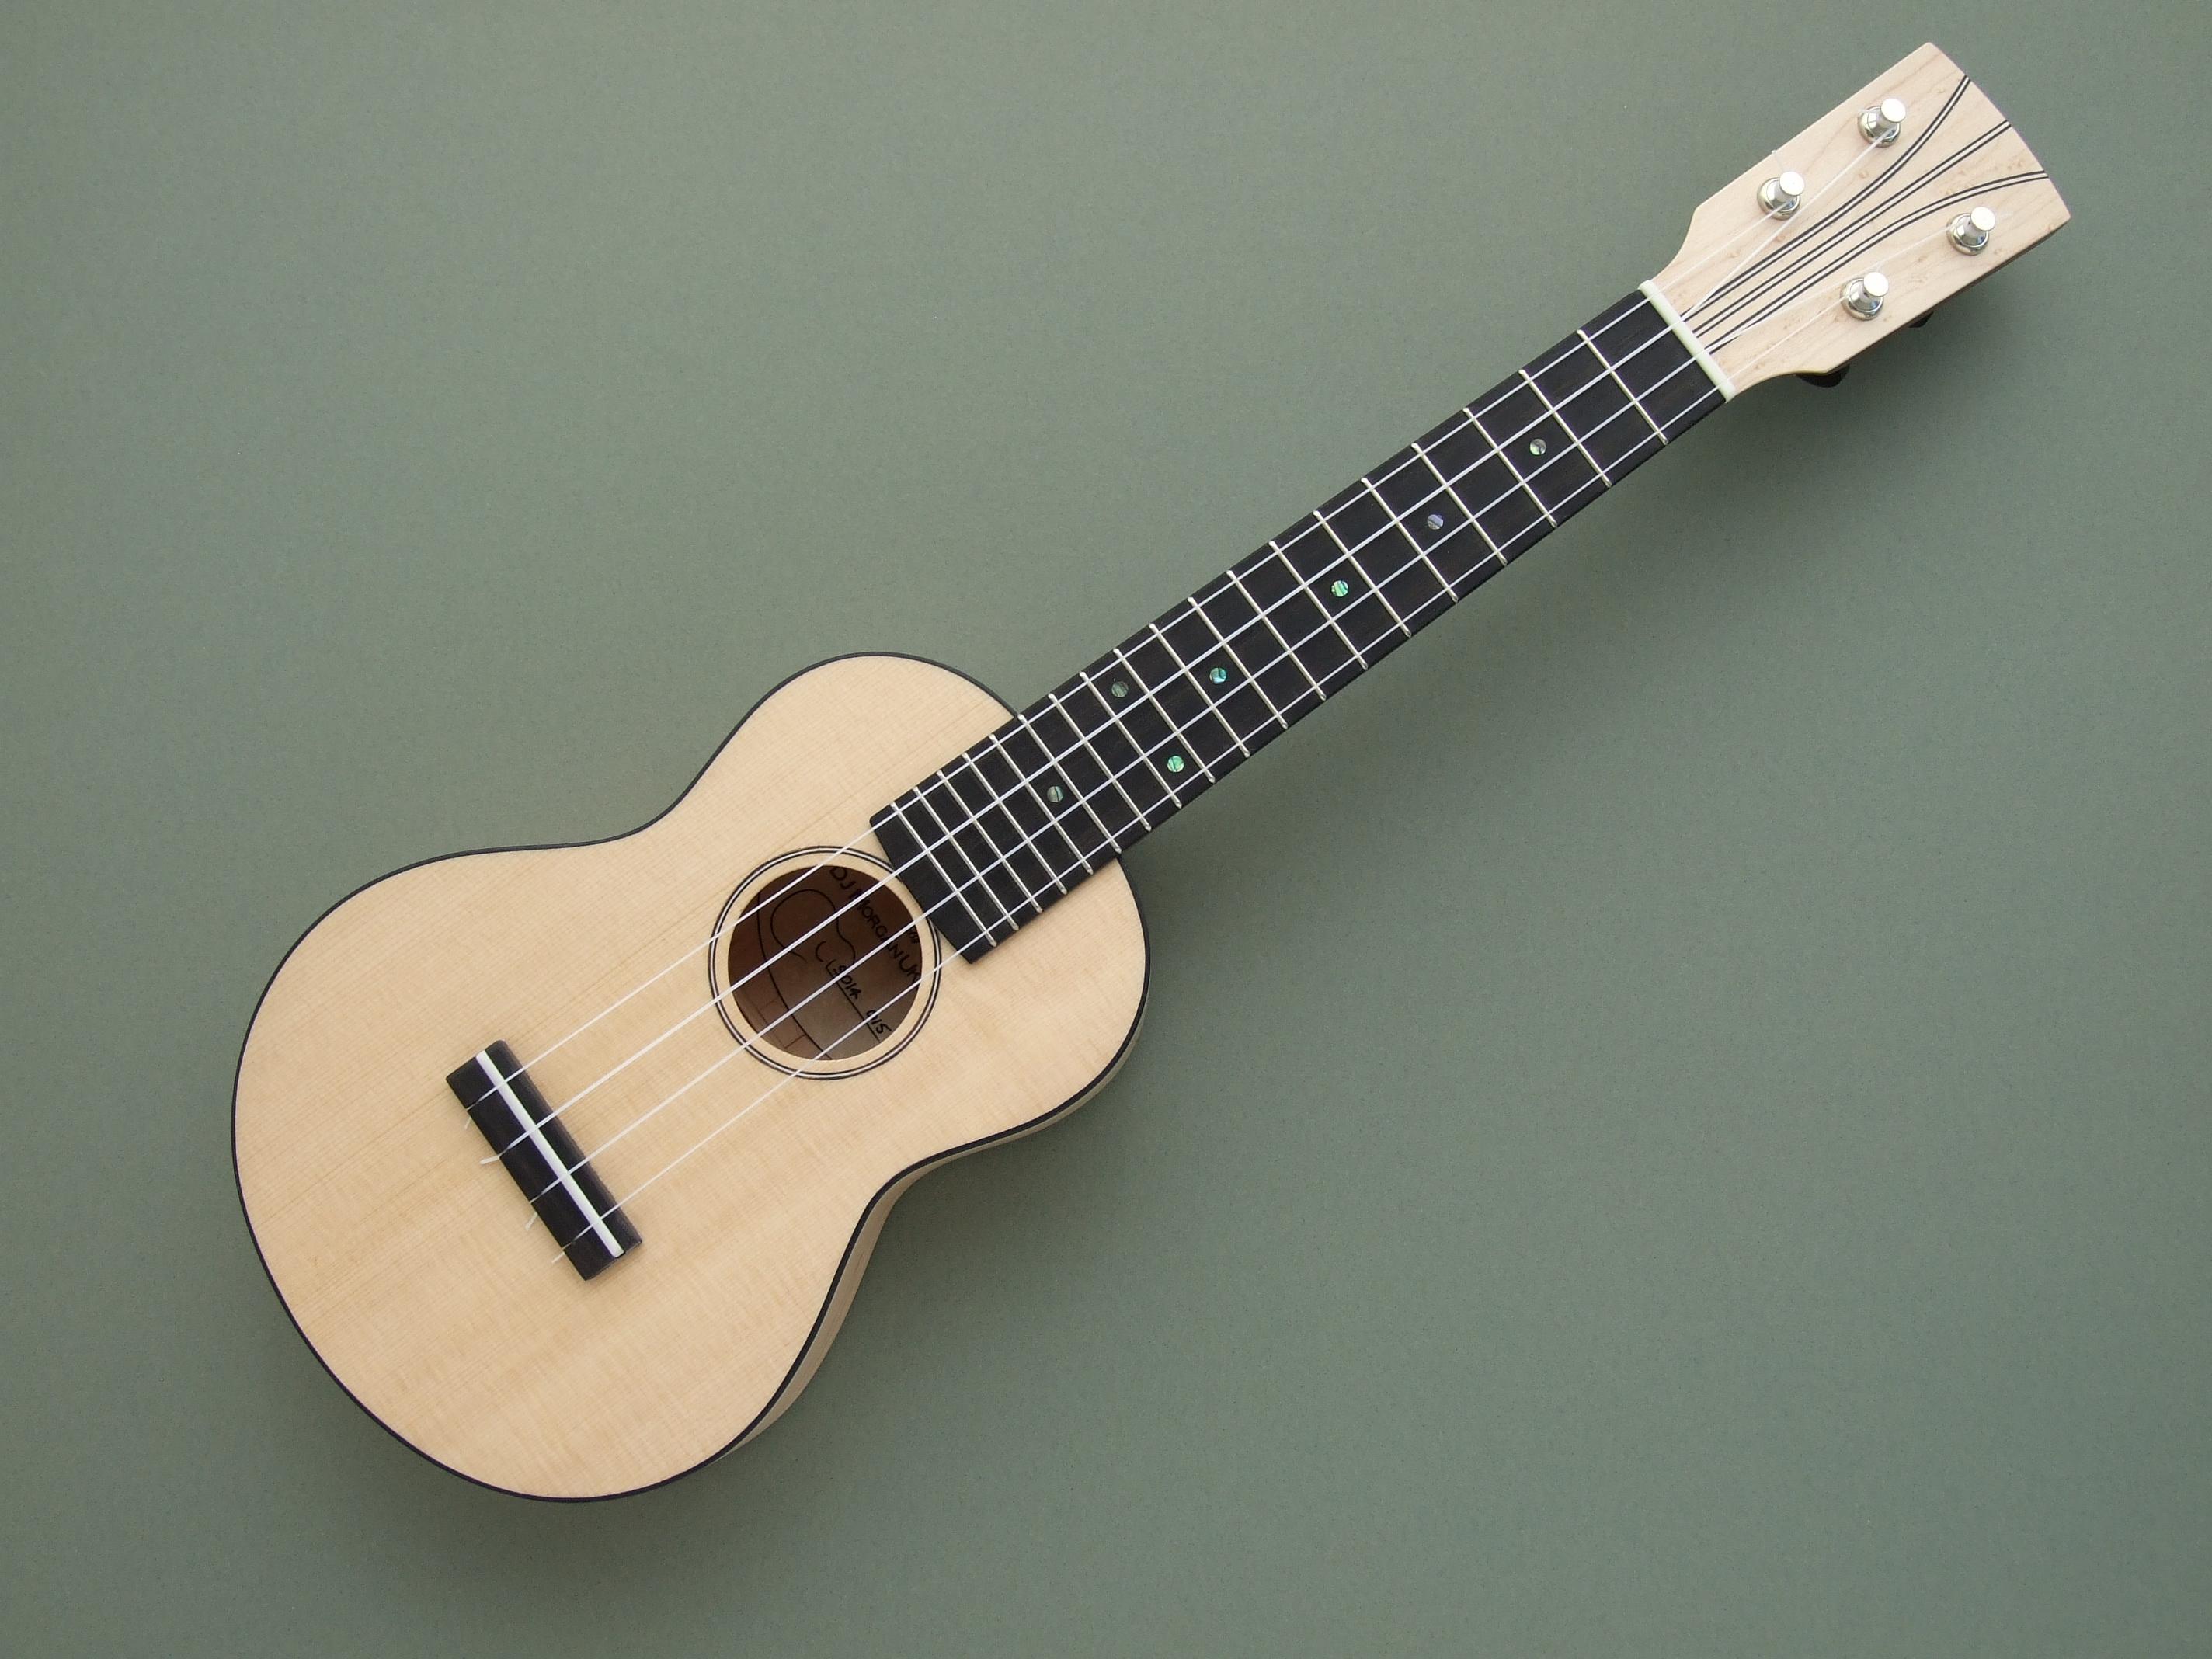 maple sitka spruce soprano ukulele with mahogany neck. Black Bedroom Furniture Sets. Home Design Ideas